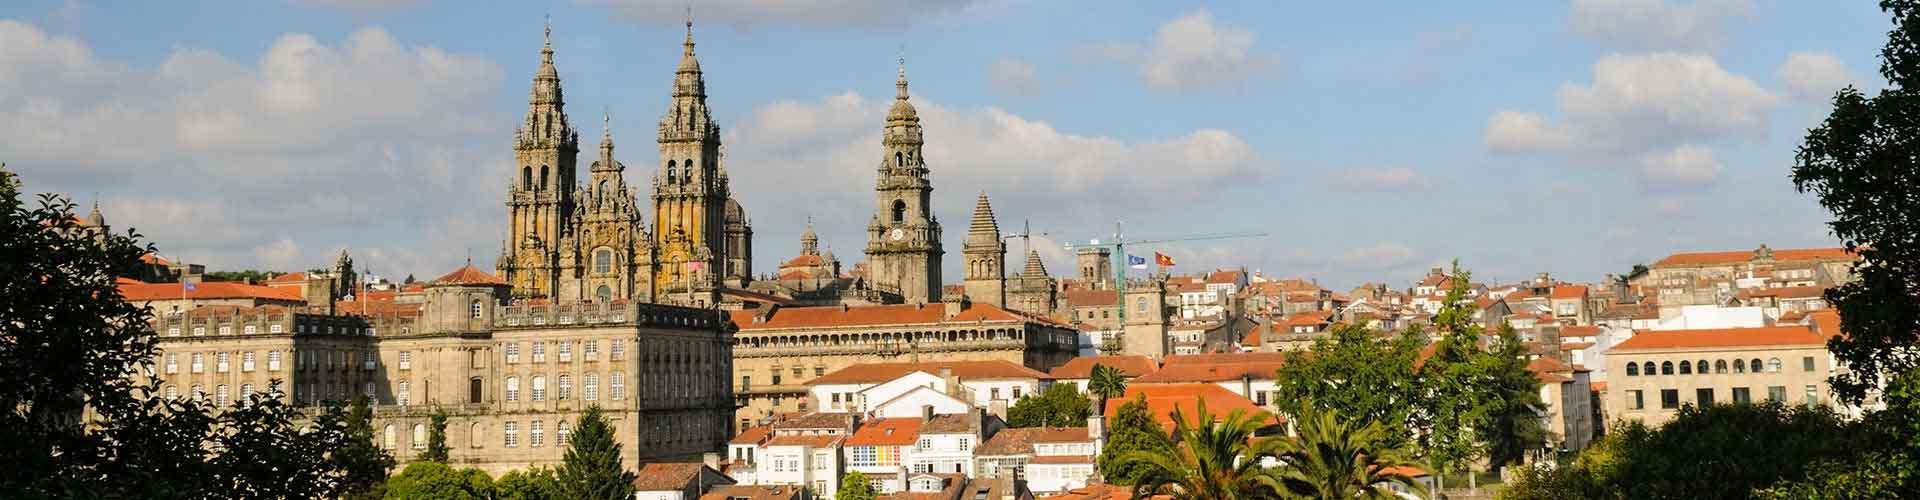 Santiago de Compostela - Camping à Santiago de Compostela. Cartes pour Santiago de Compostela, photos et commentaires pour chaque Camping à Santiago de Compostela.